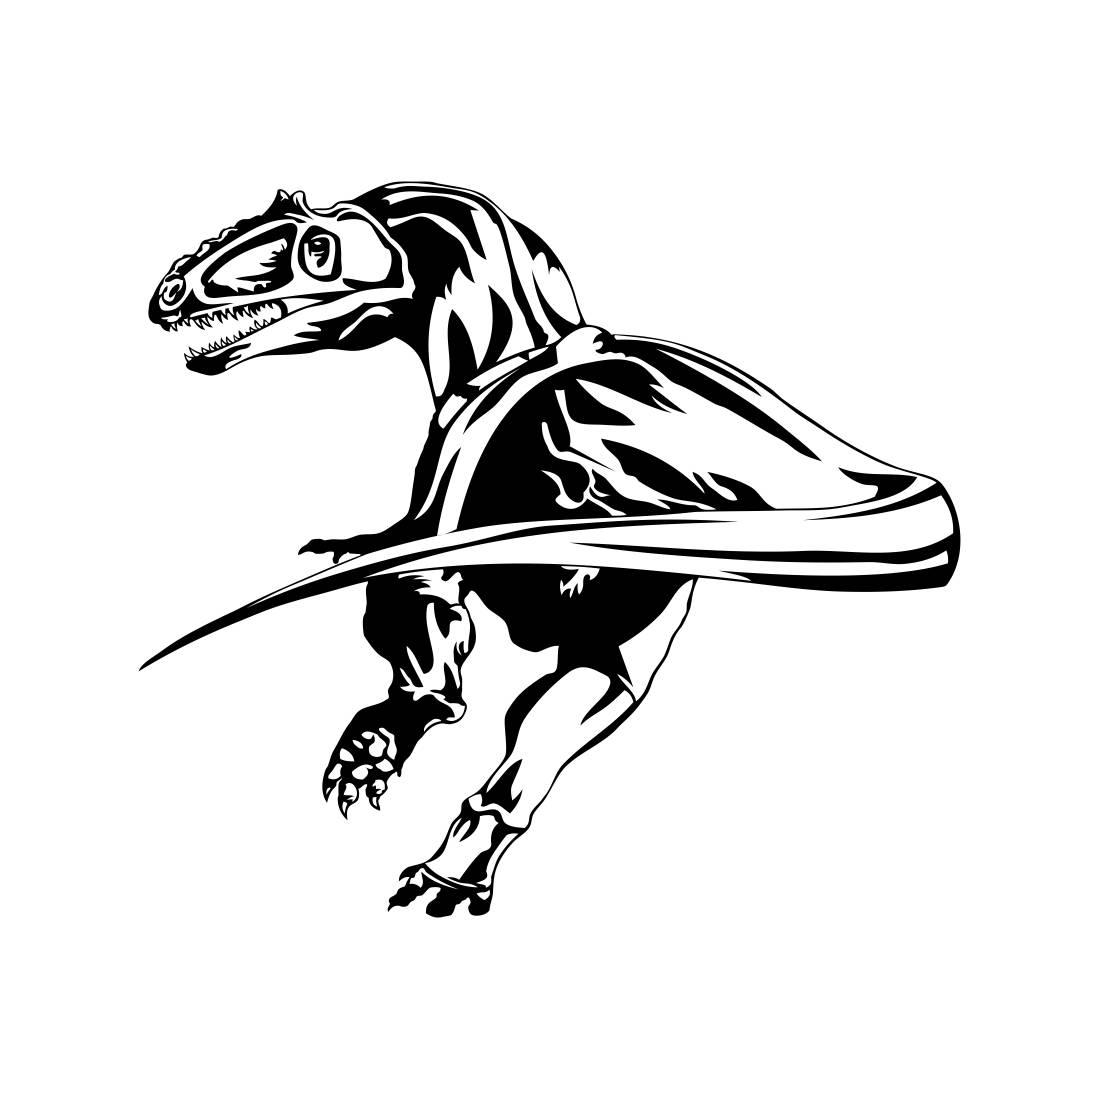 Dinosaur Dino T Rex Trex Graphics Svg Dxf Eps